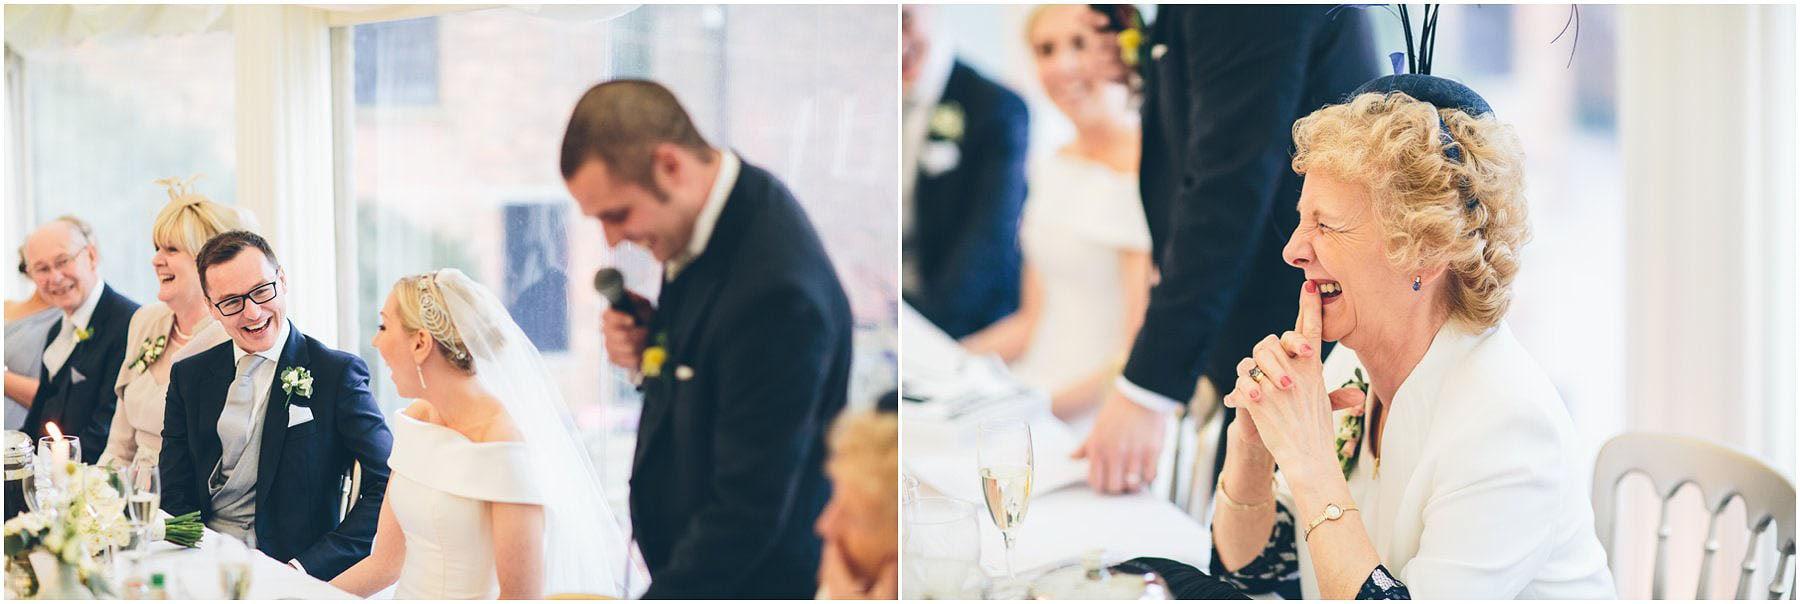 Capesthorne_Hall_Wedding_Photography_0120